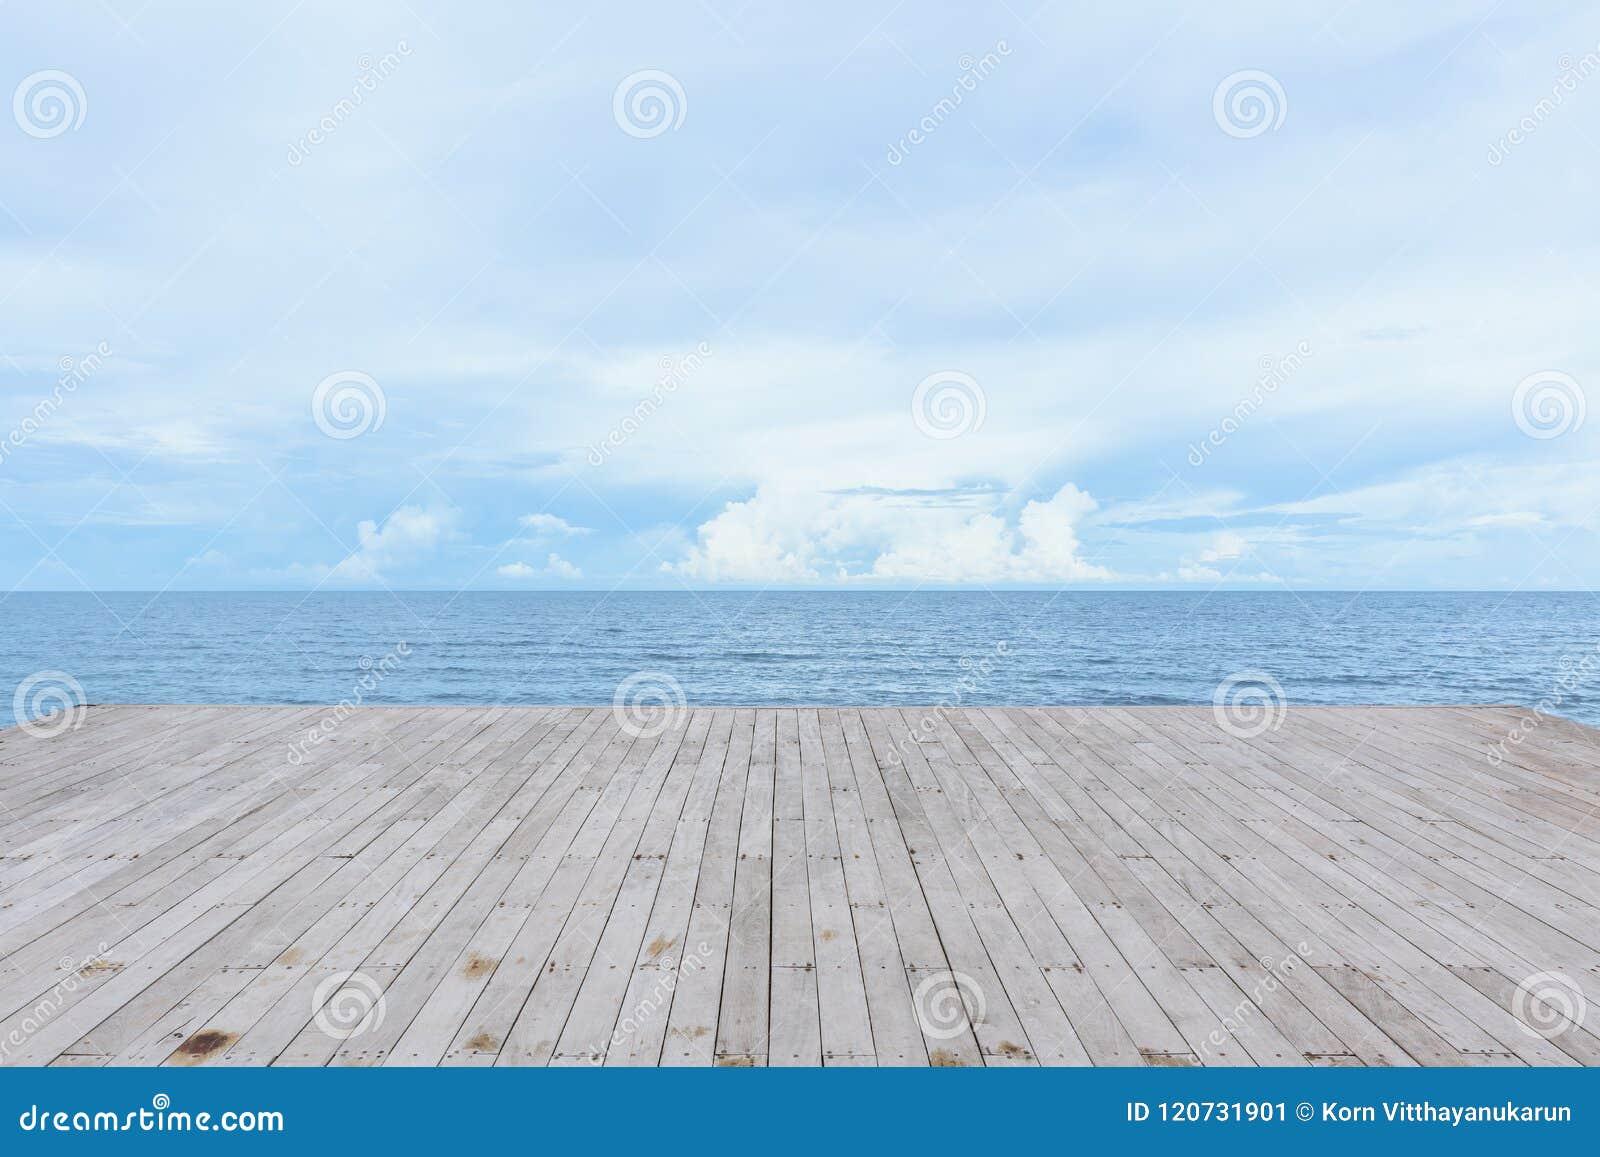 Empty wood deck pier with sea ocean view